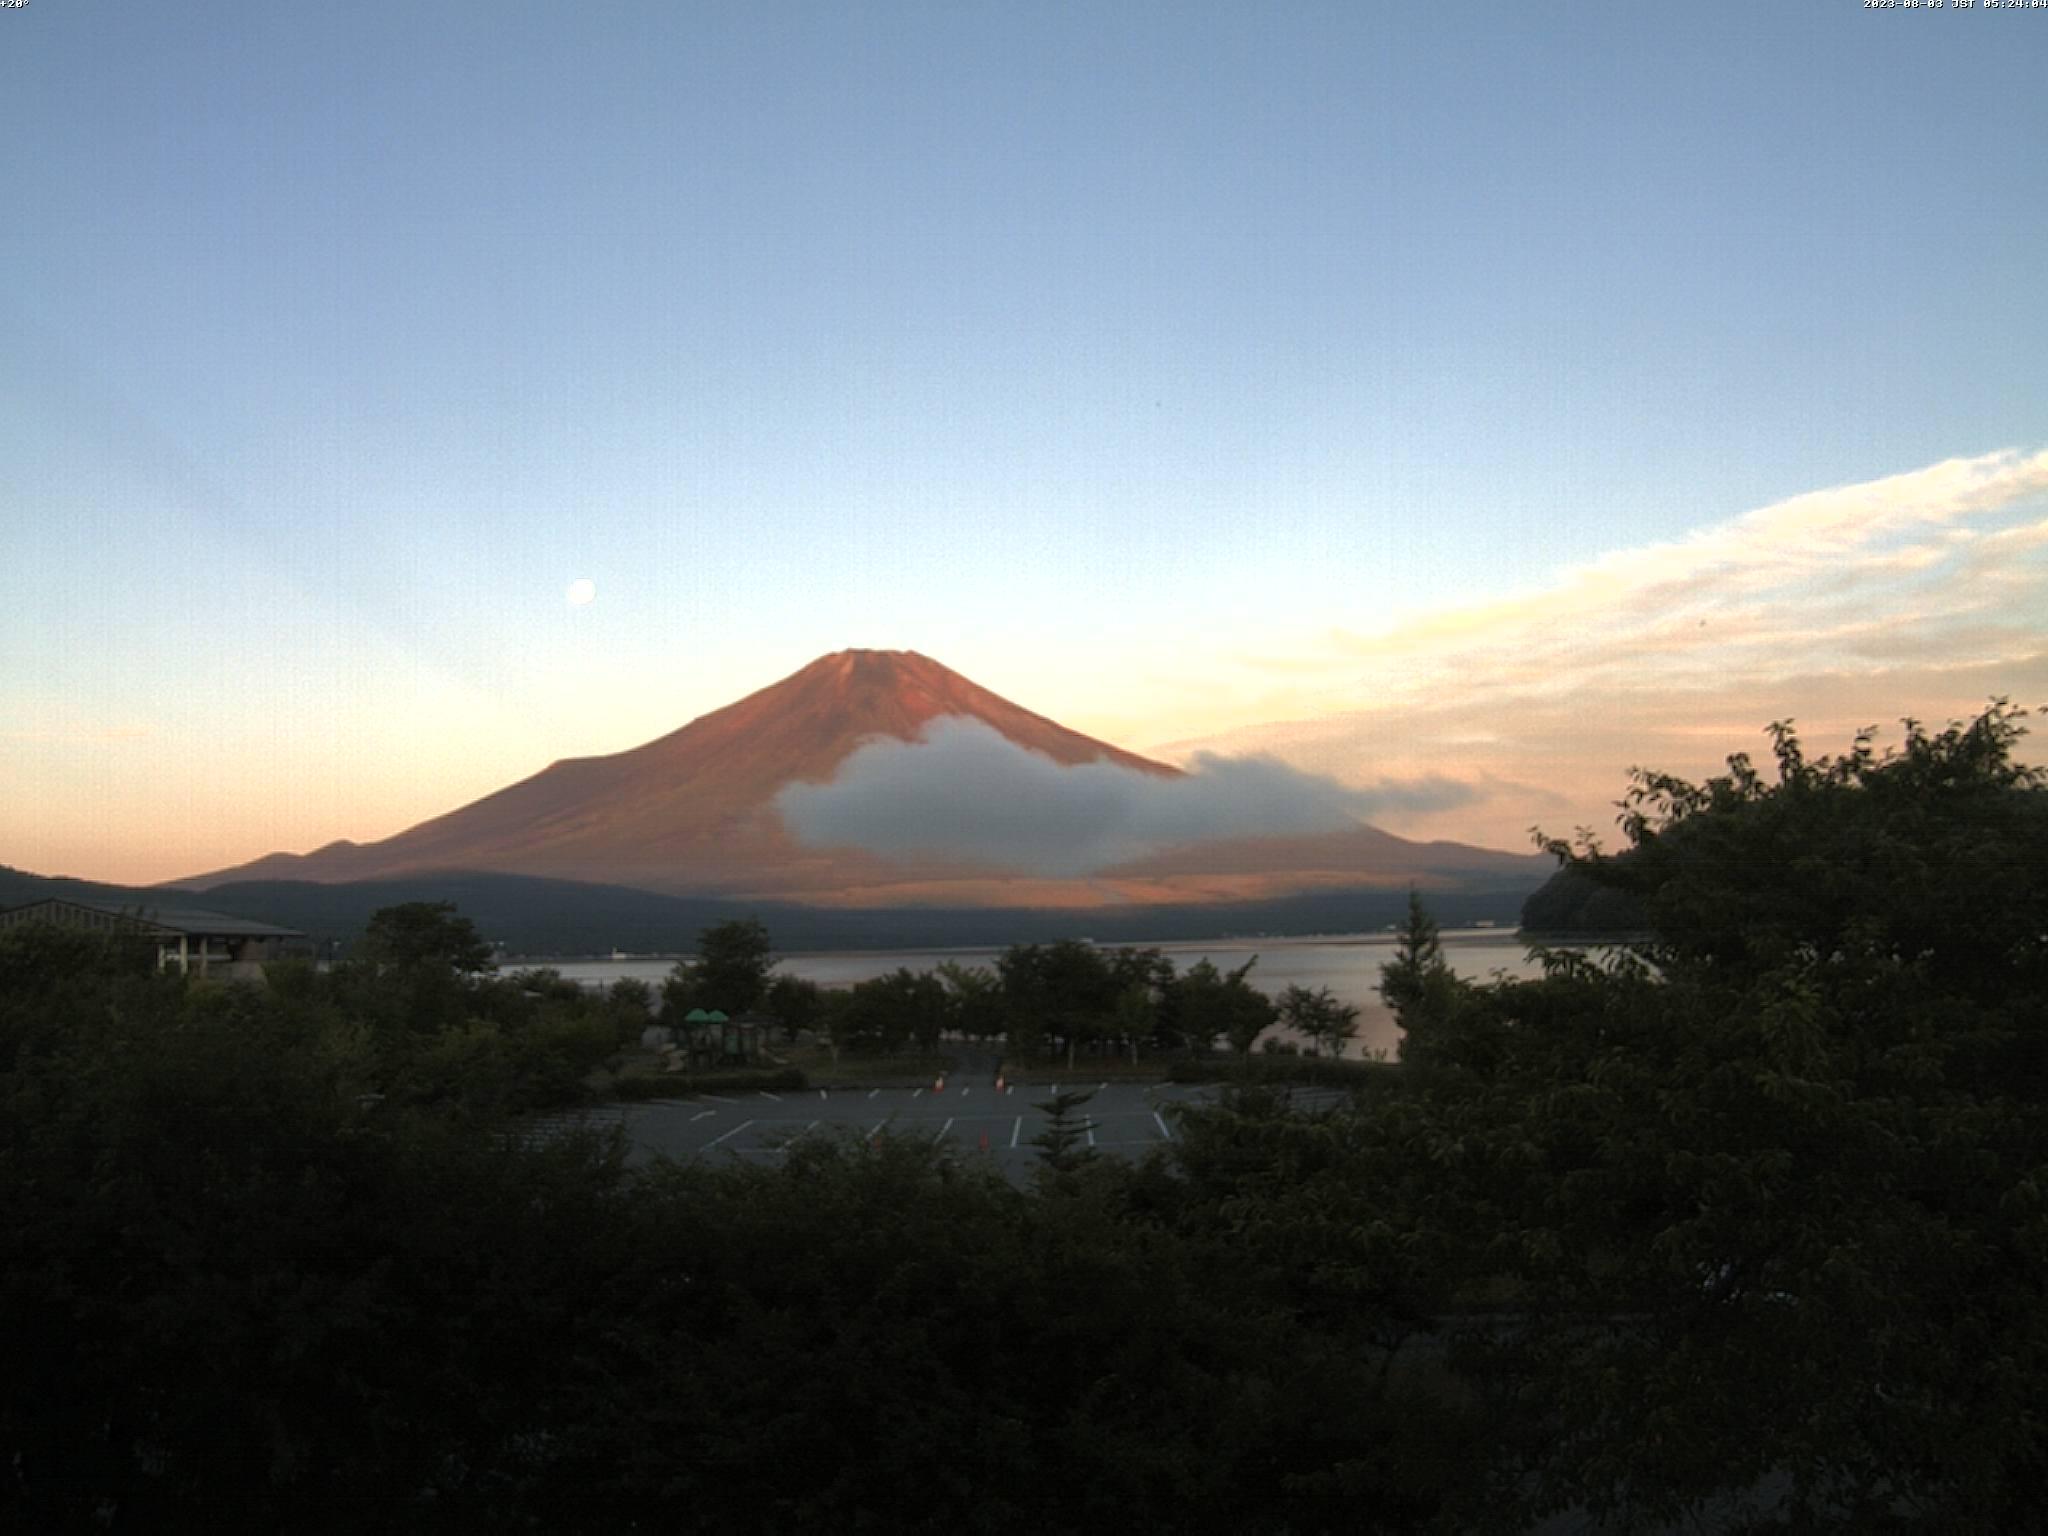 富士山ライブカメラ(裾野市河川敷カメラ)